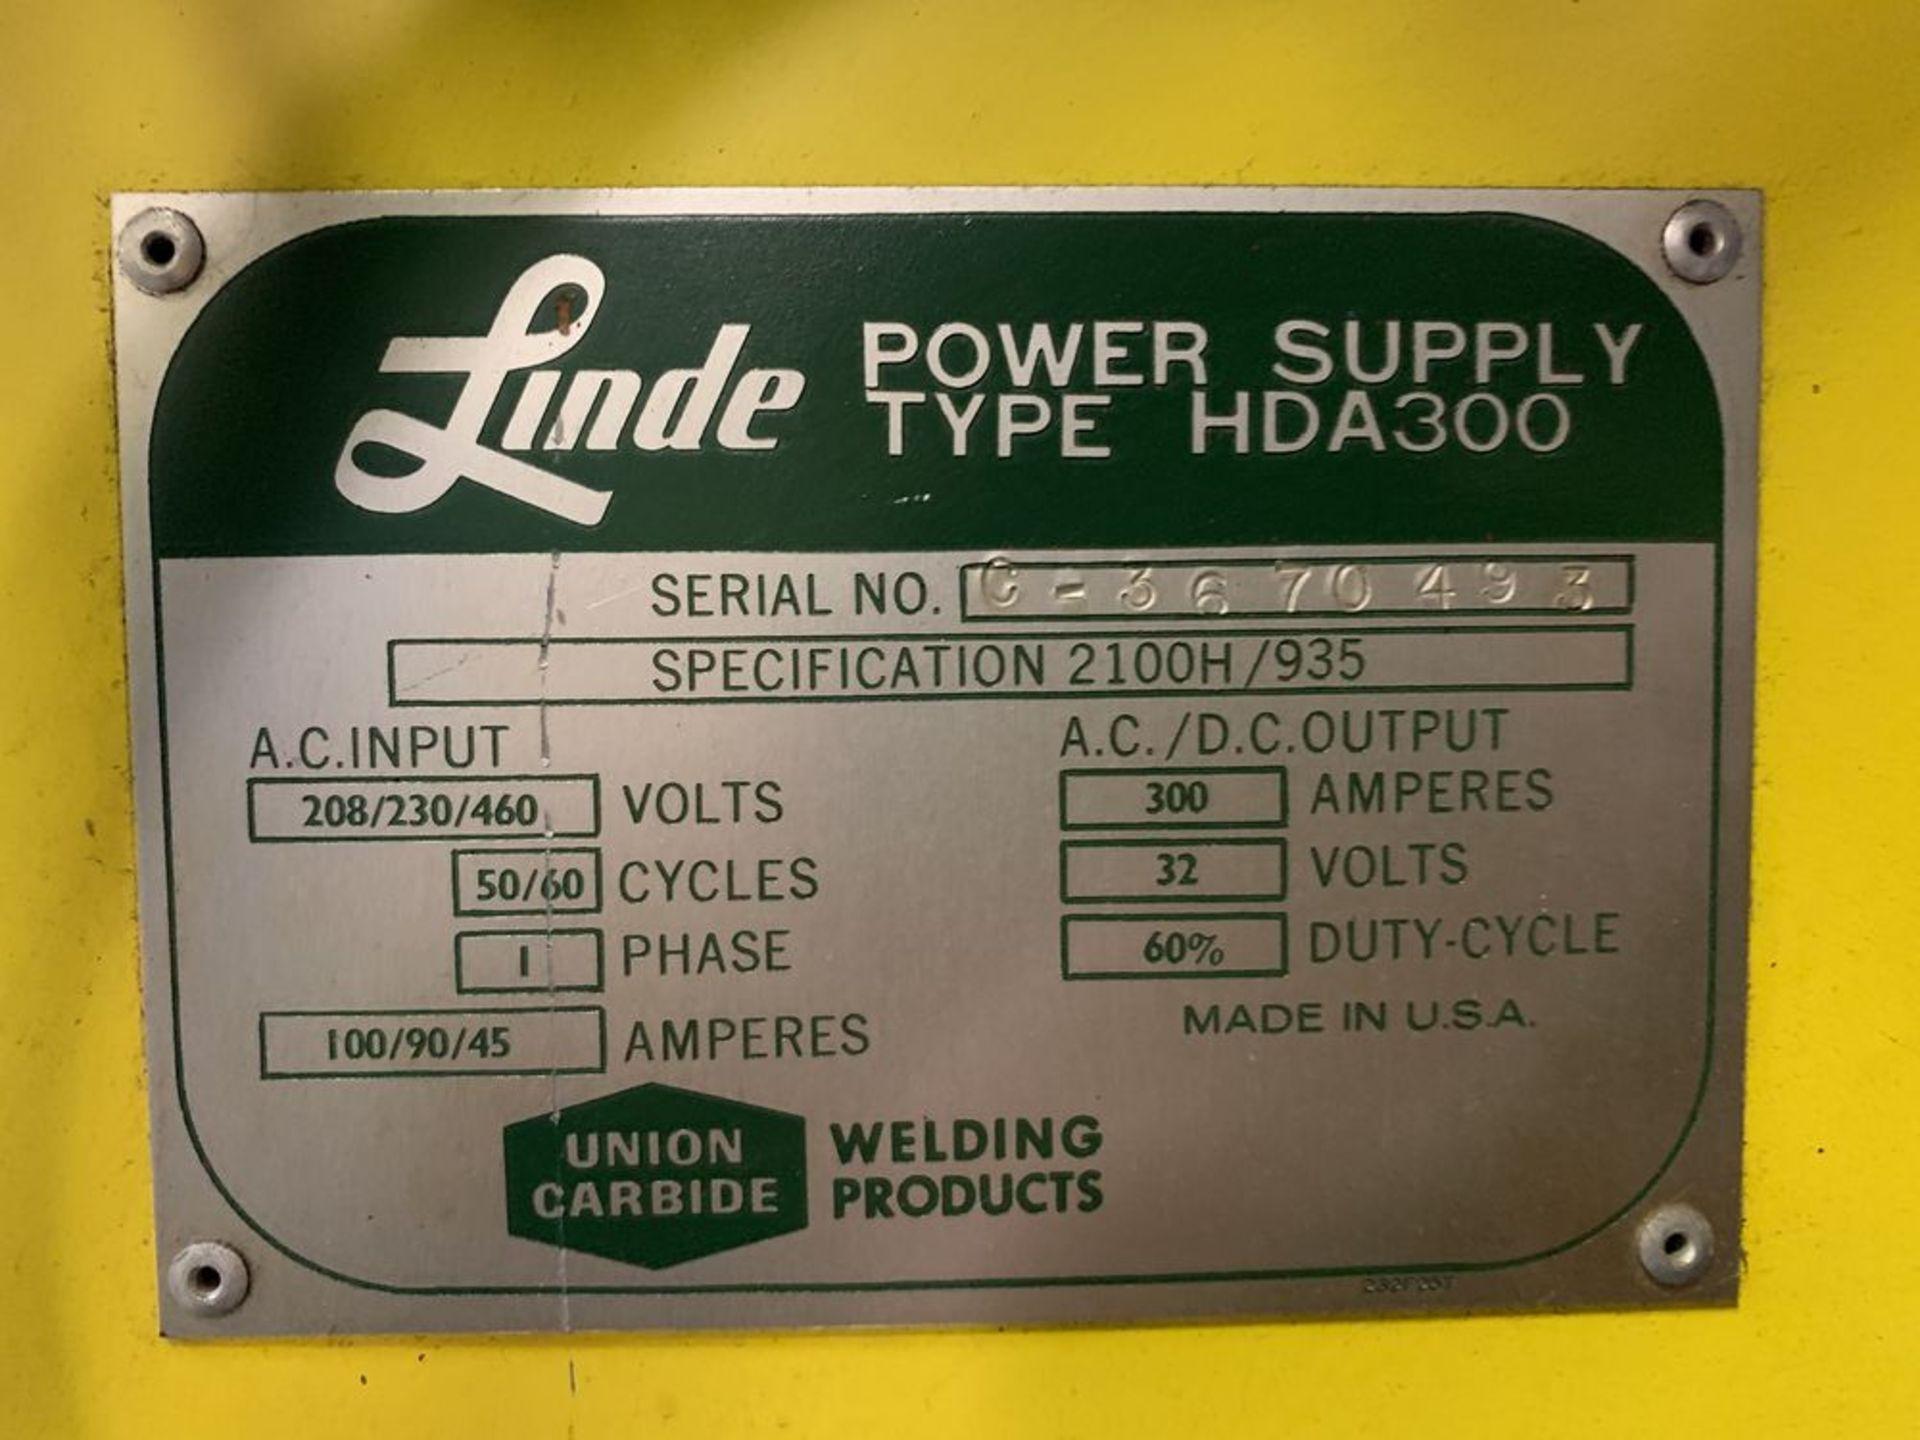 Lot 16 - Union Carbide Linde Power Supply #HDA-300